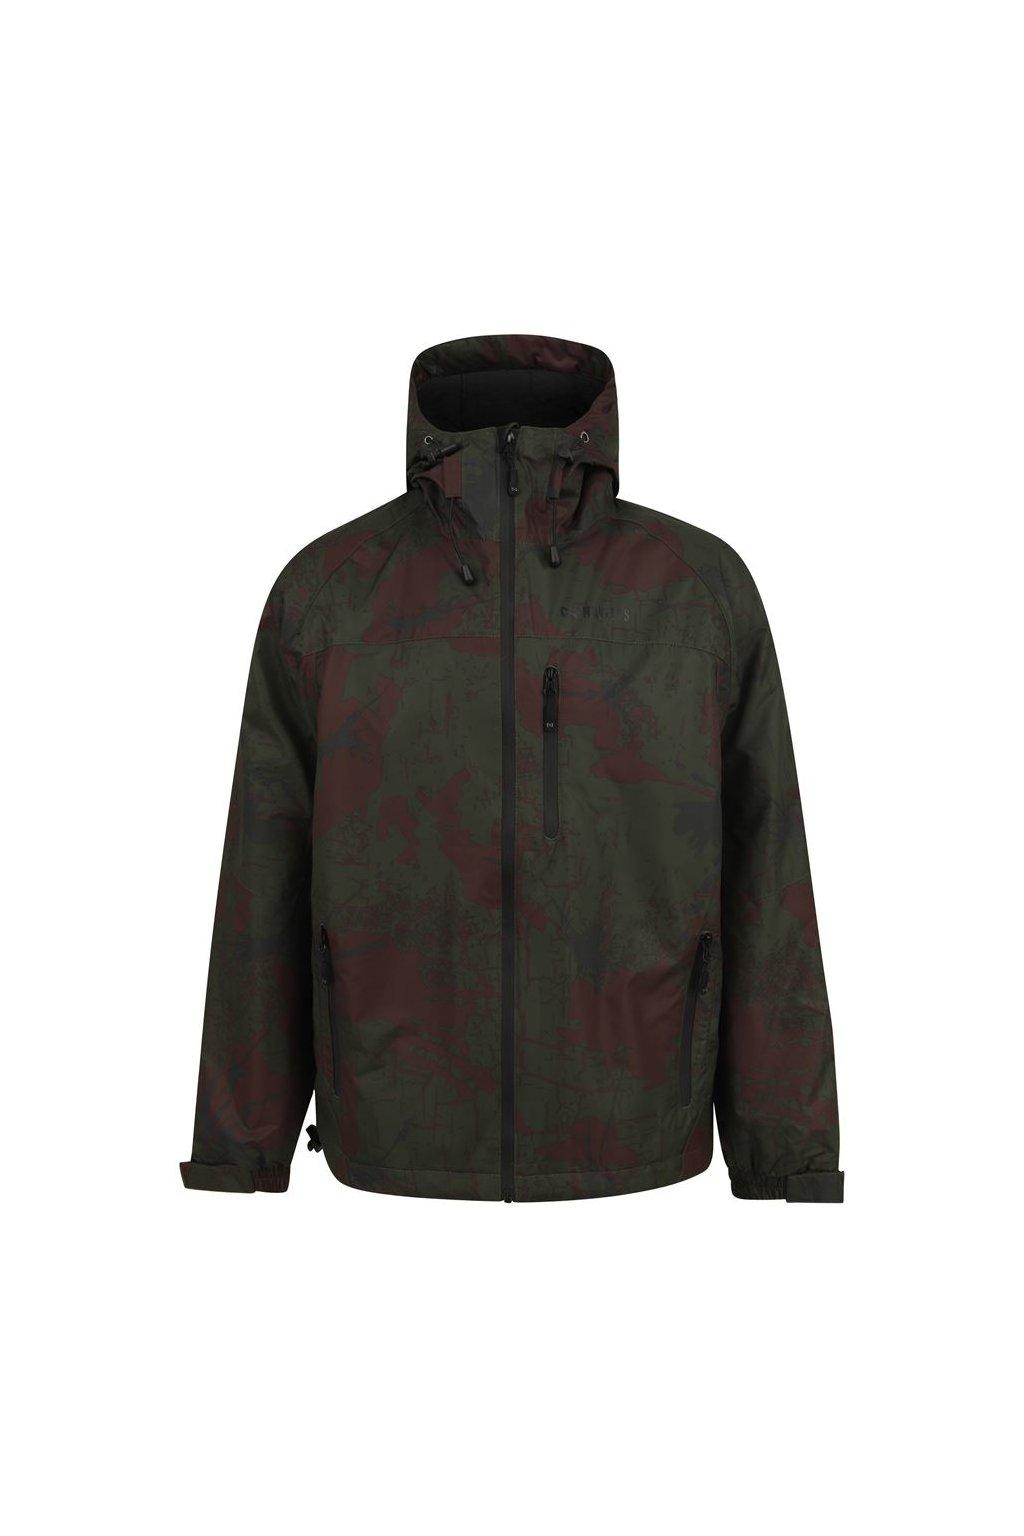 Navitas: Bunda Scout Jacket Camo 2.0 Velikost S